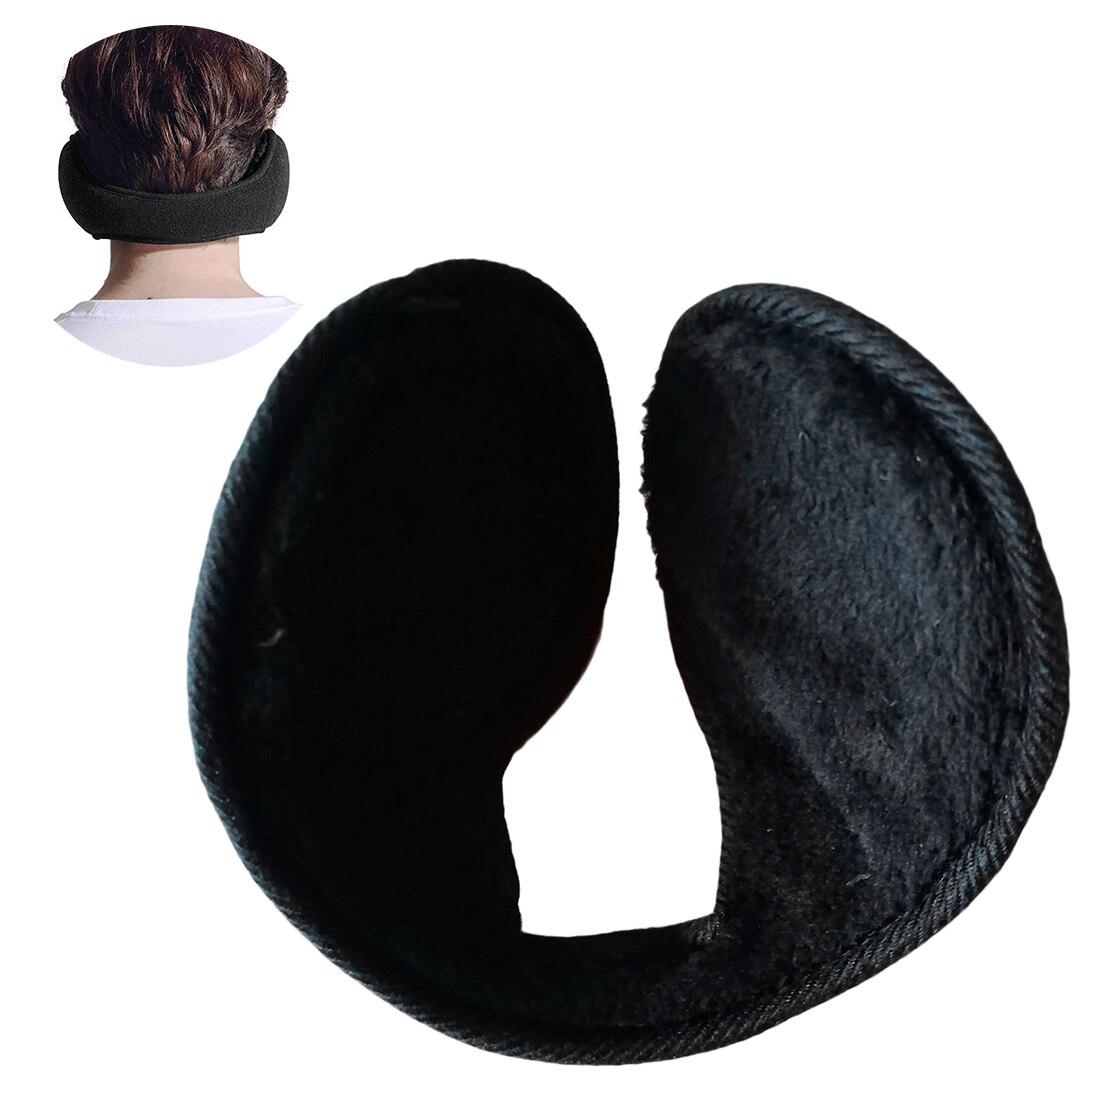 Unisex Ear Muffs Winter Ear warmer Fleece Earwarmer Behind the Head Band Design^